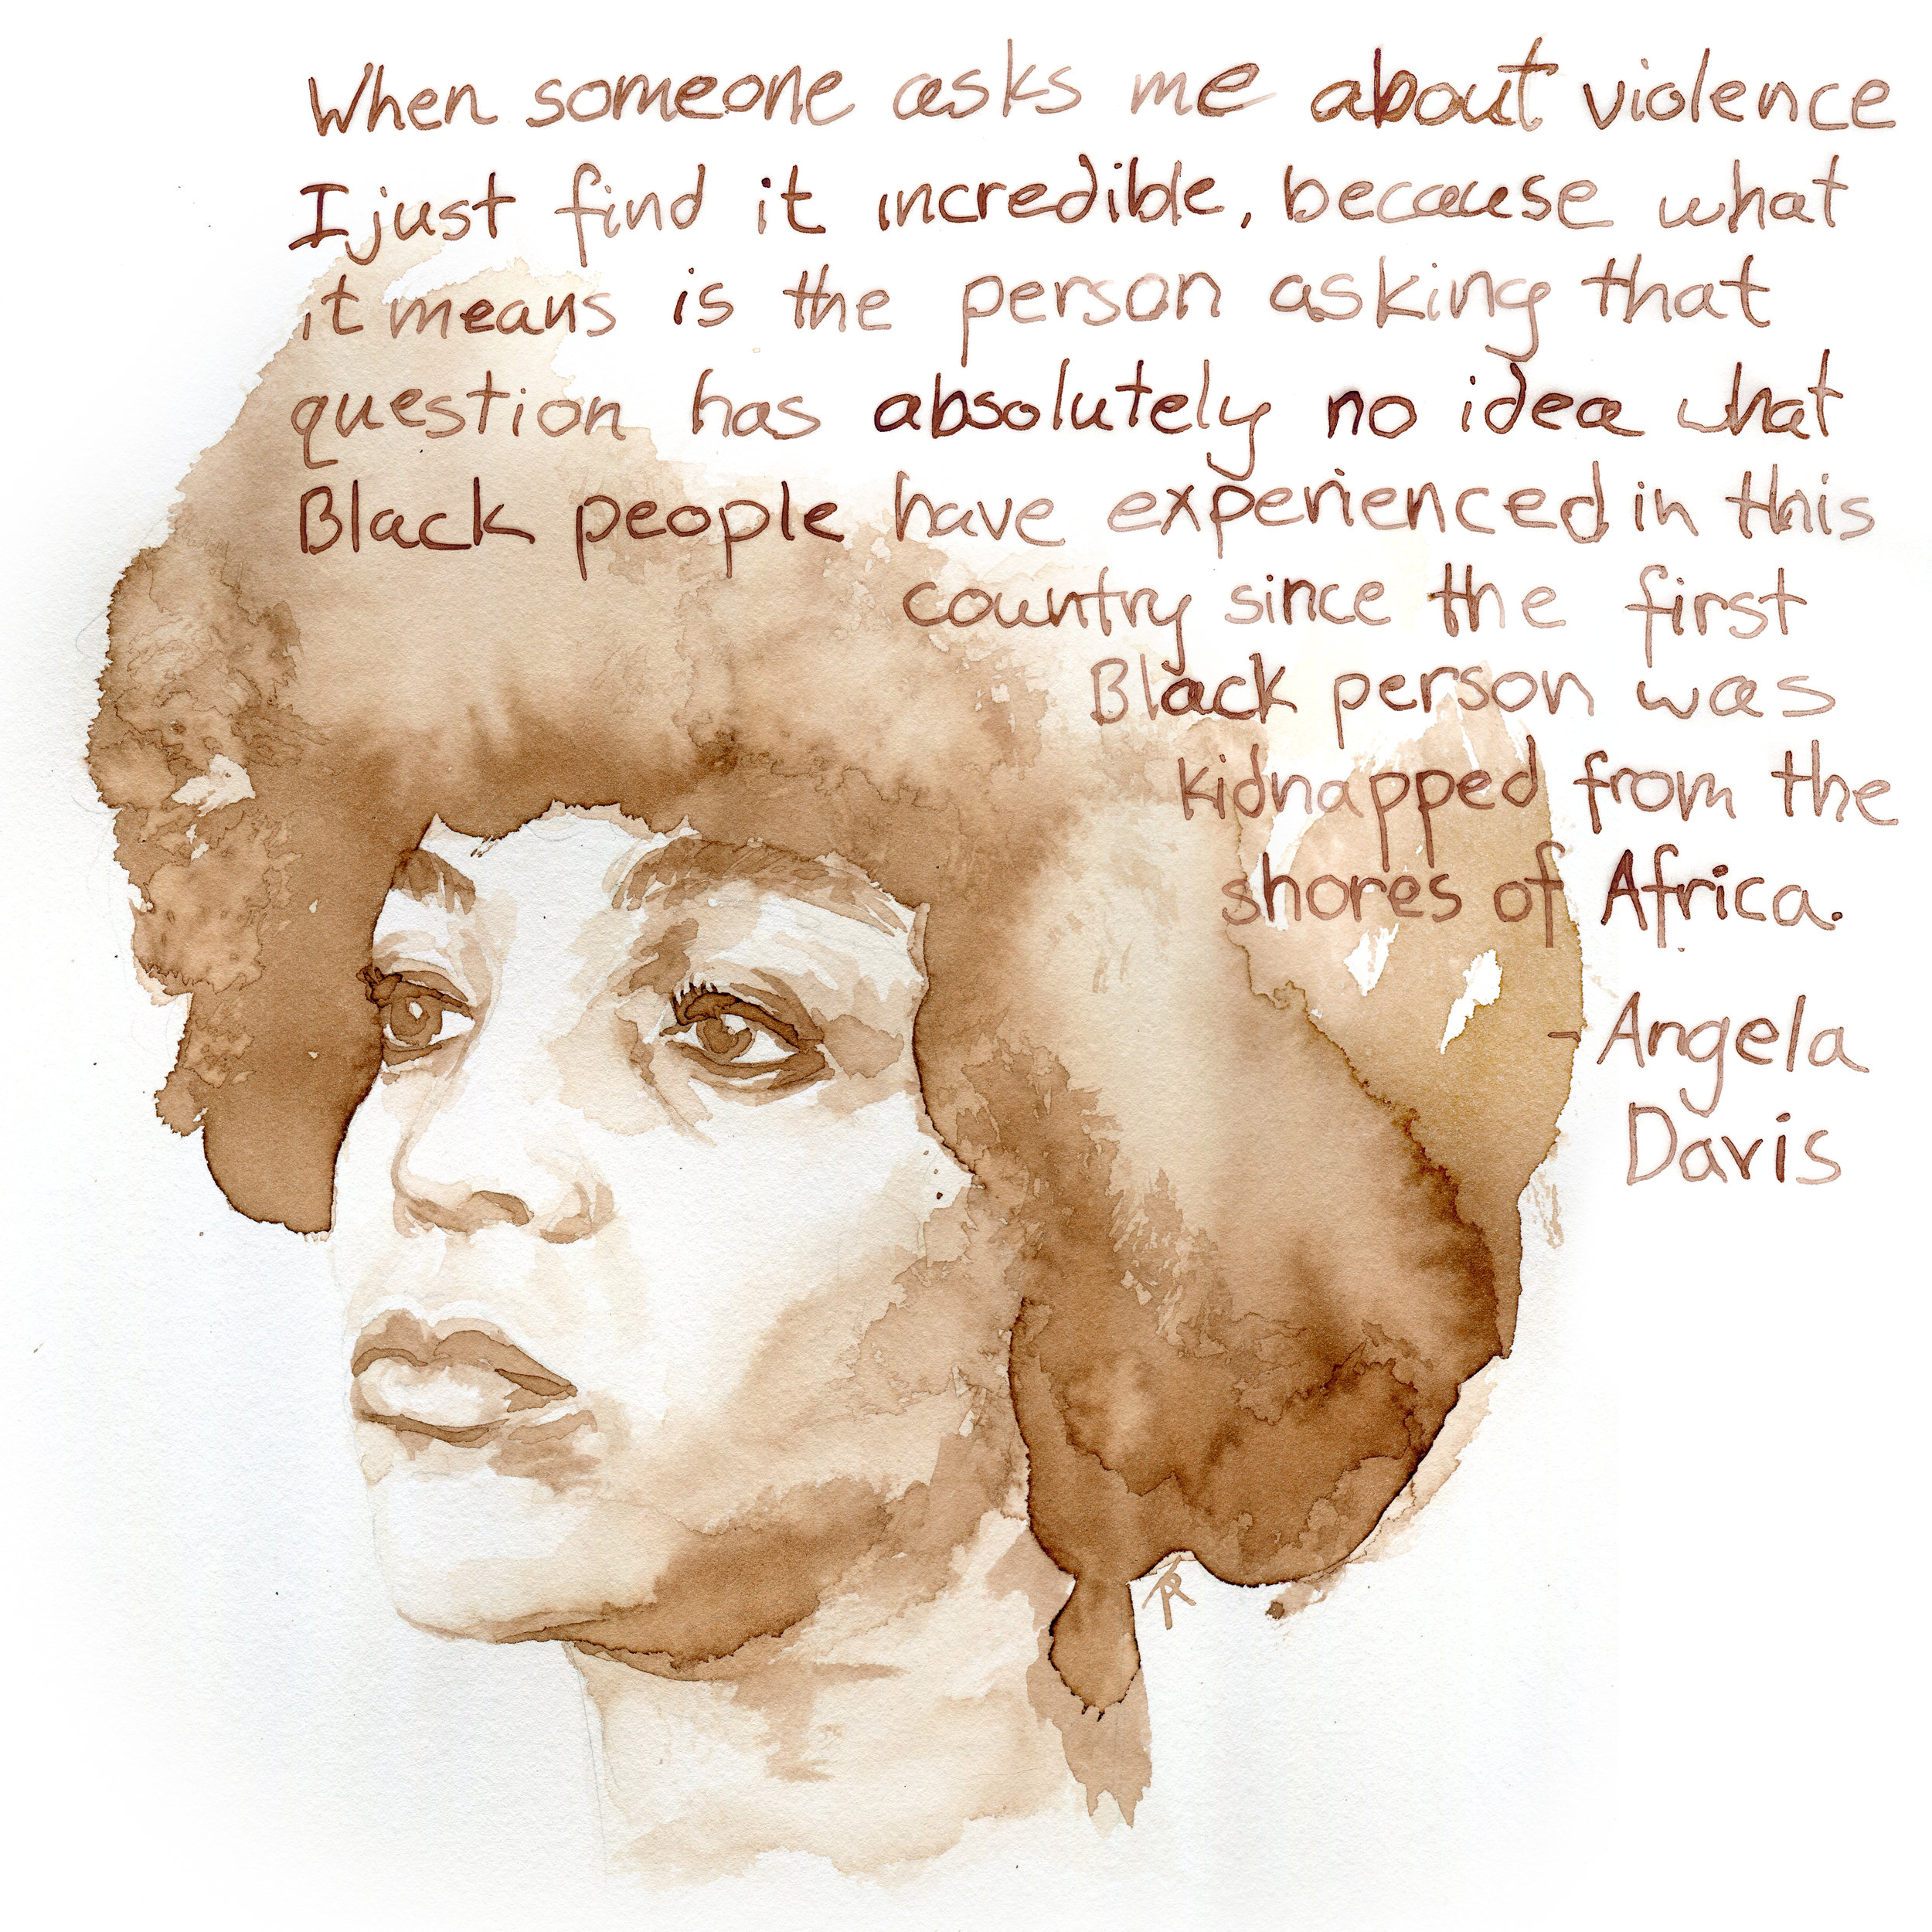 Angela Davis-violence brown.jpg